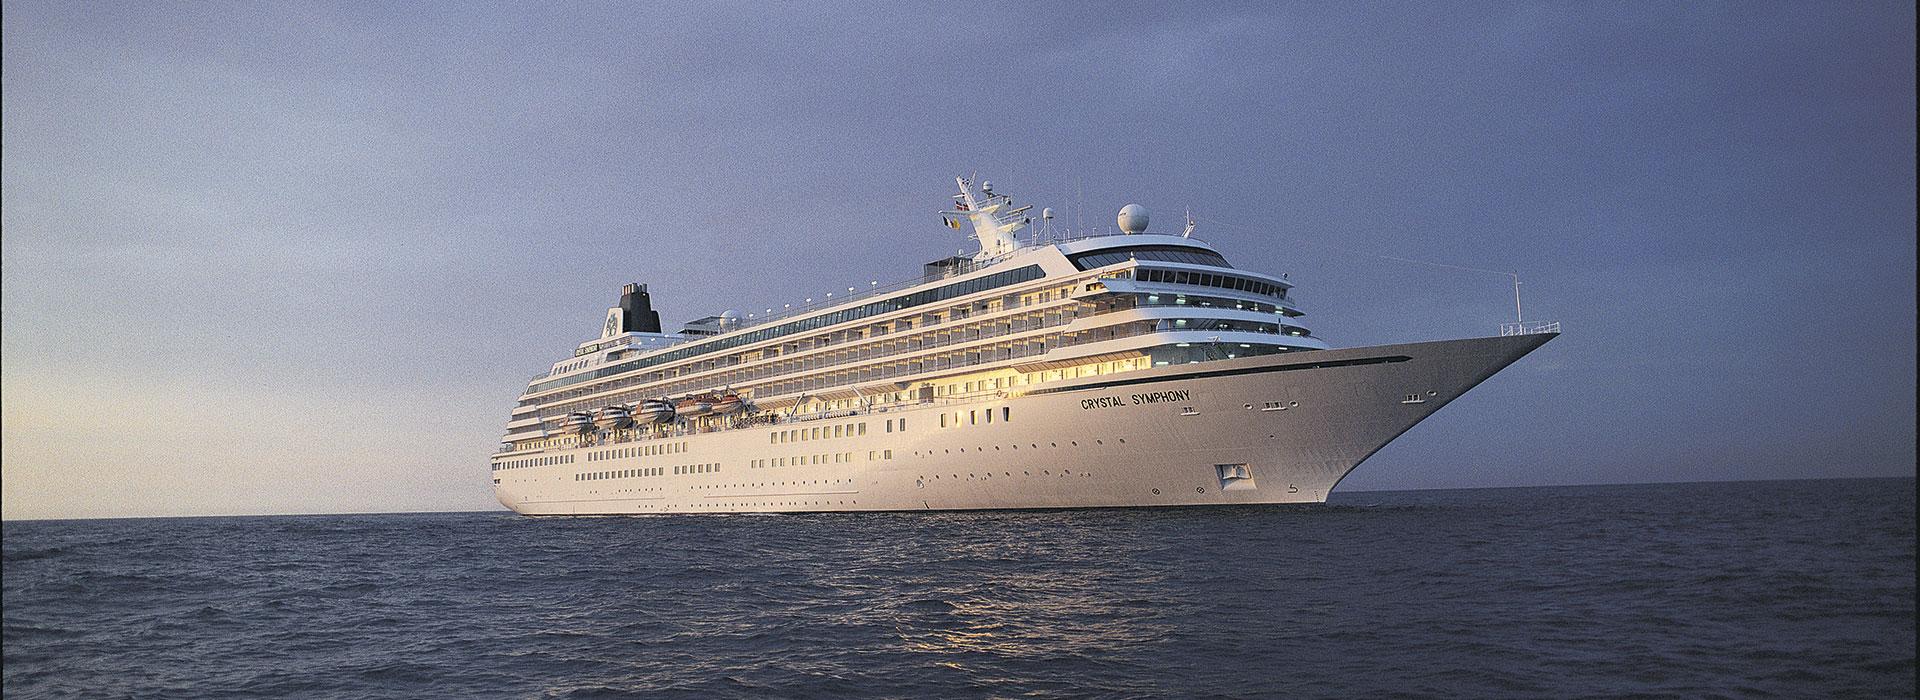 Luxuskreuzfahrtschiff Crystal Symphony